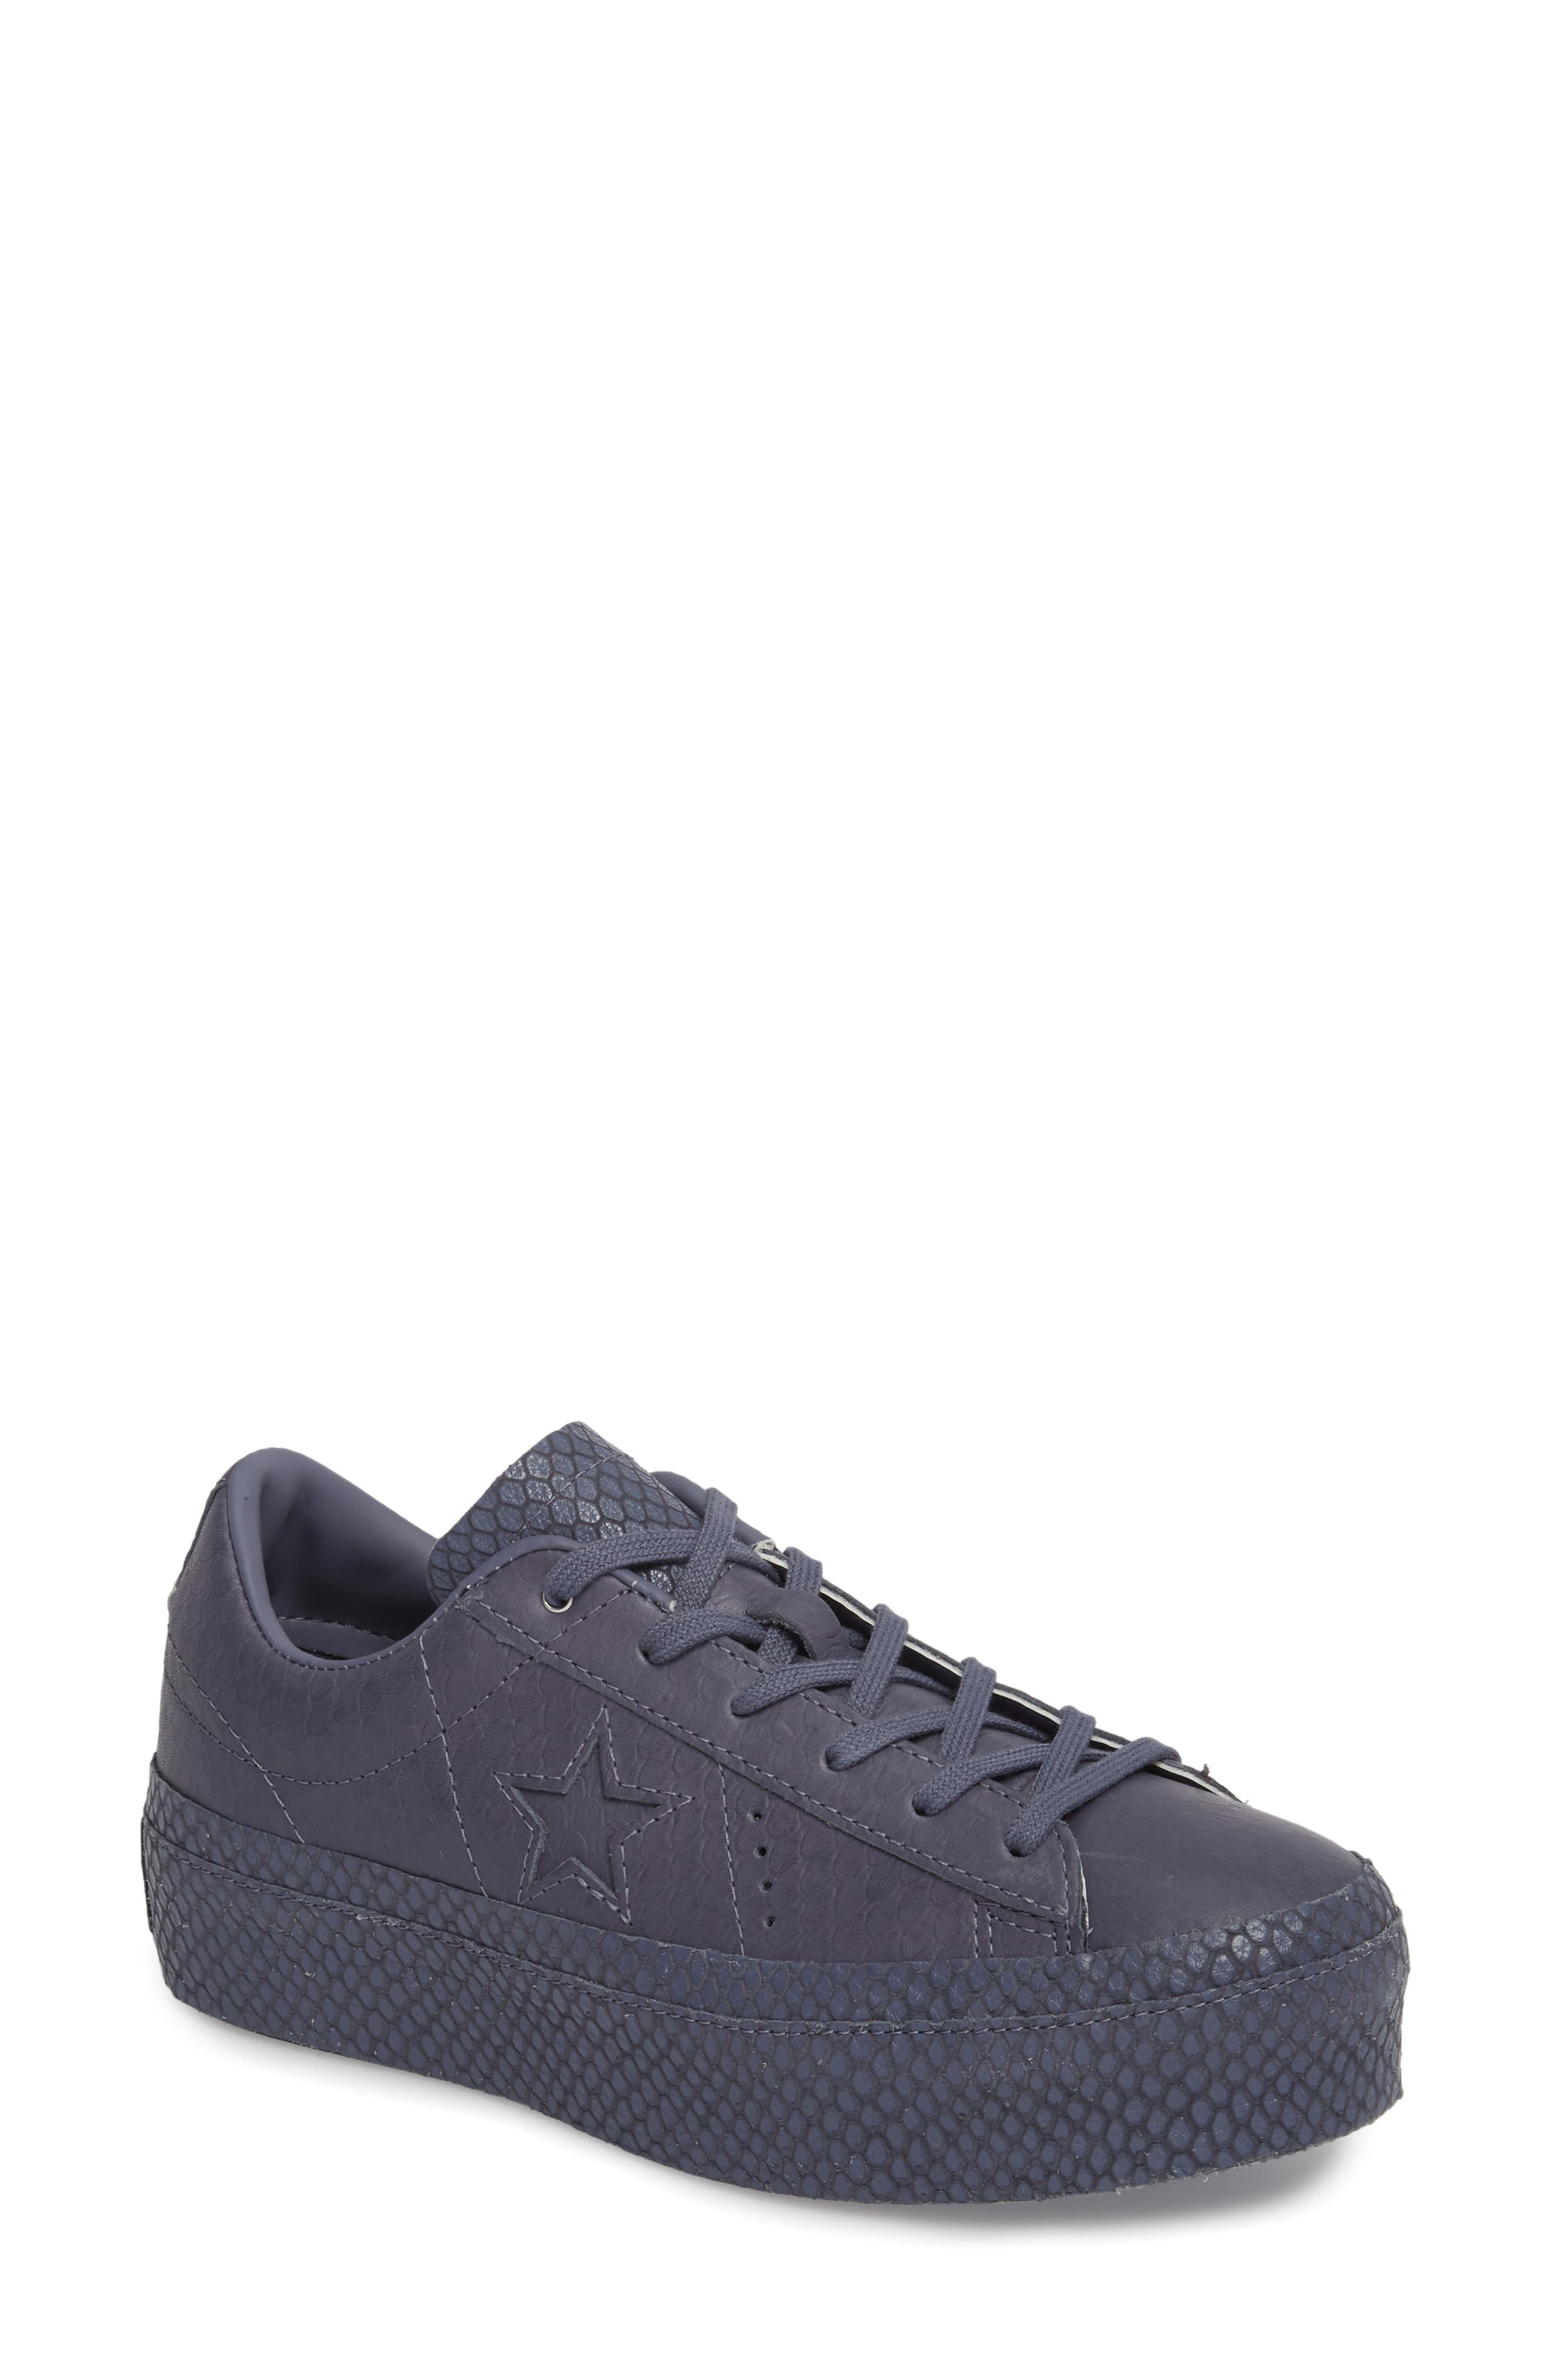 Chuck Taylor<sup>®</sup> All Star<sup>®</sup> One Star Platform Sneaker,                             Main thumbnail 1, color,                             450